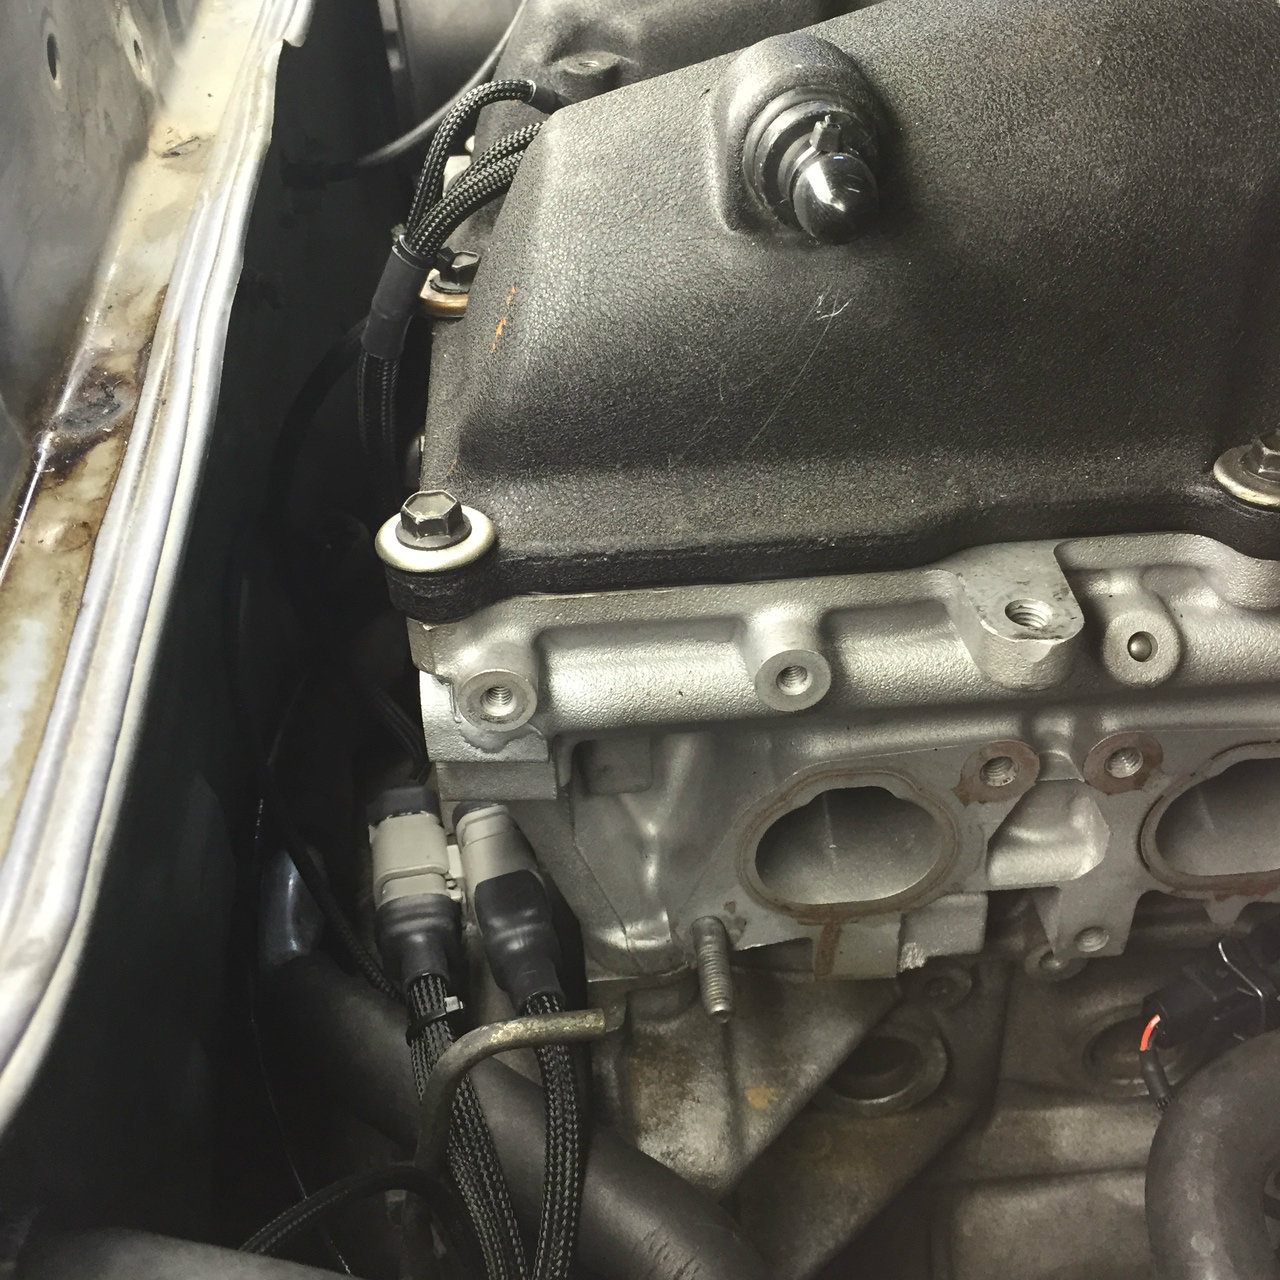 Chase Bays CM2 Engine Harness - Nissan S13 & S14 KA24DE